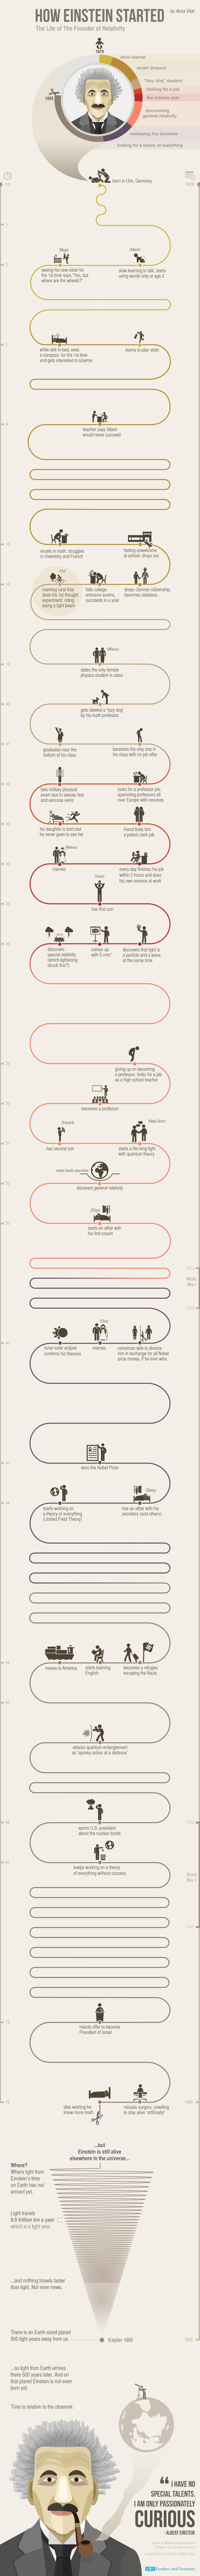 An Infographic To Show You How Einstein Failed And Failed Again